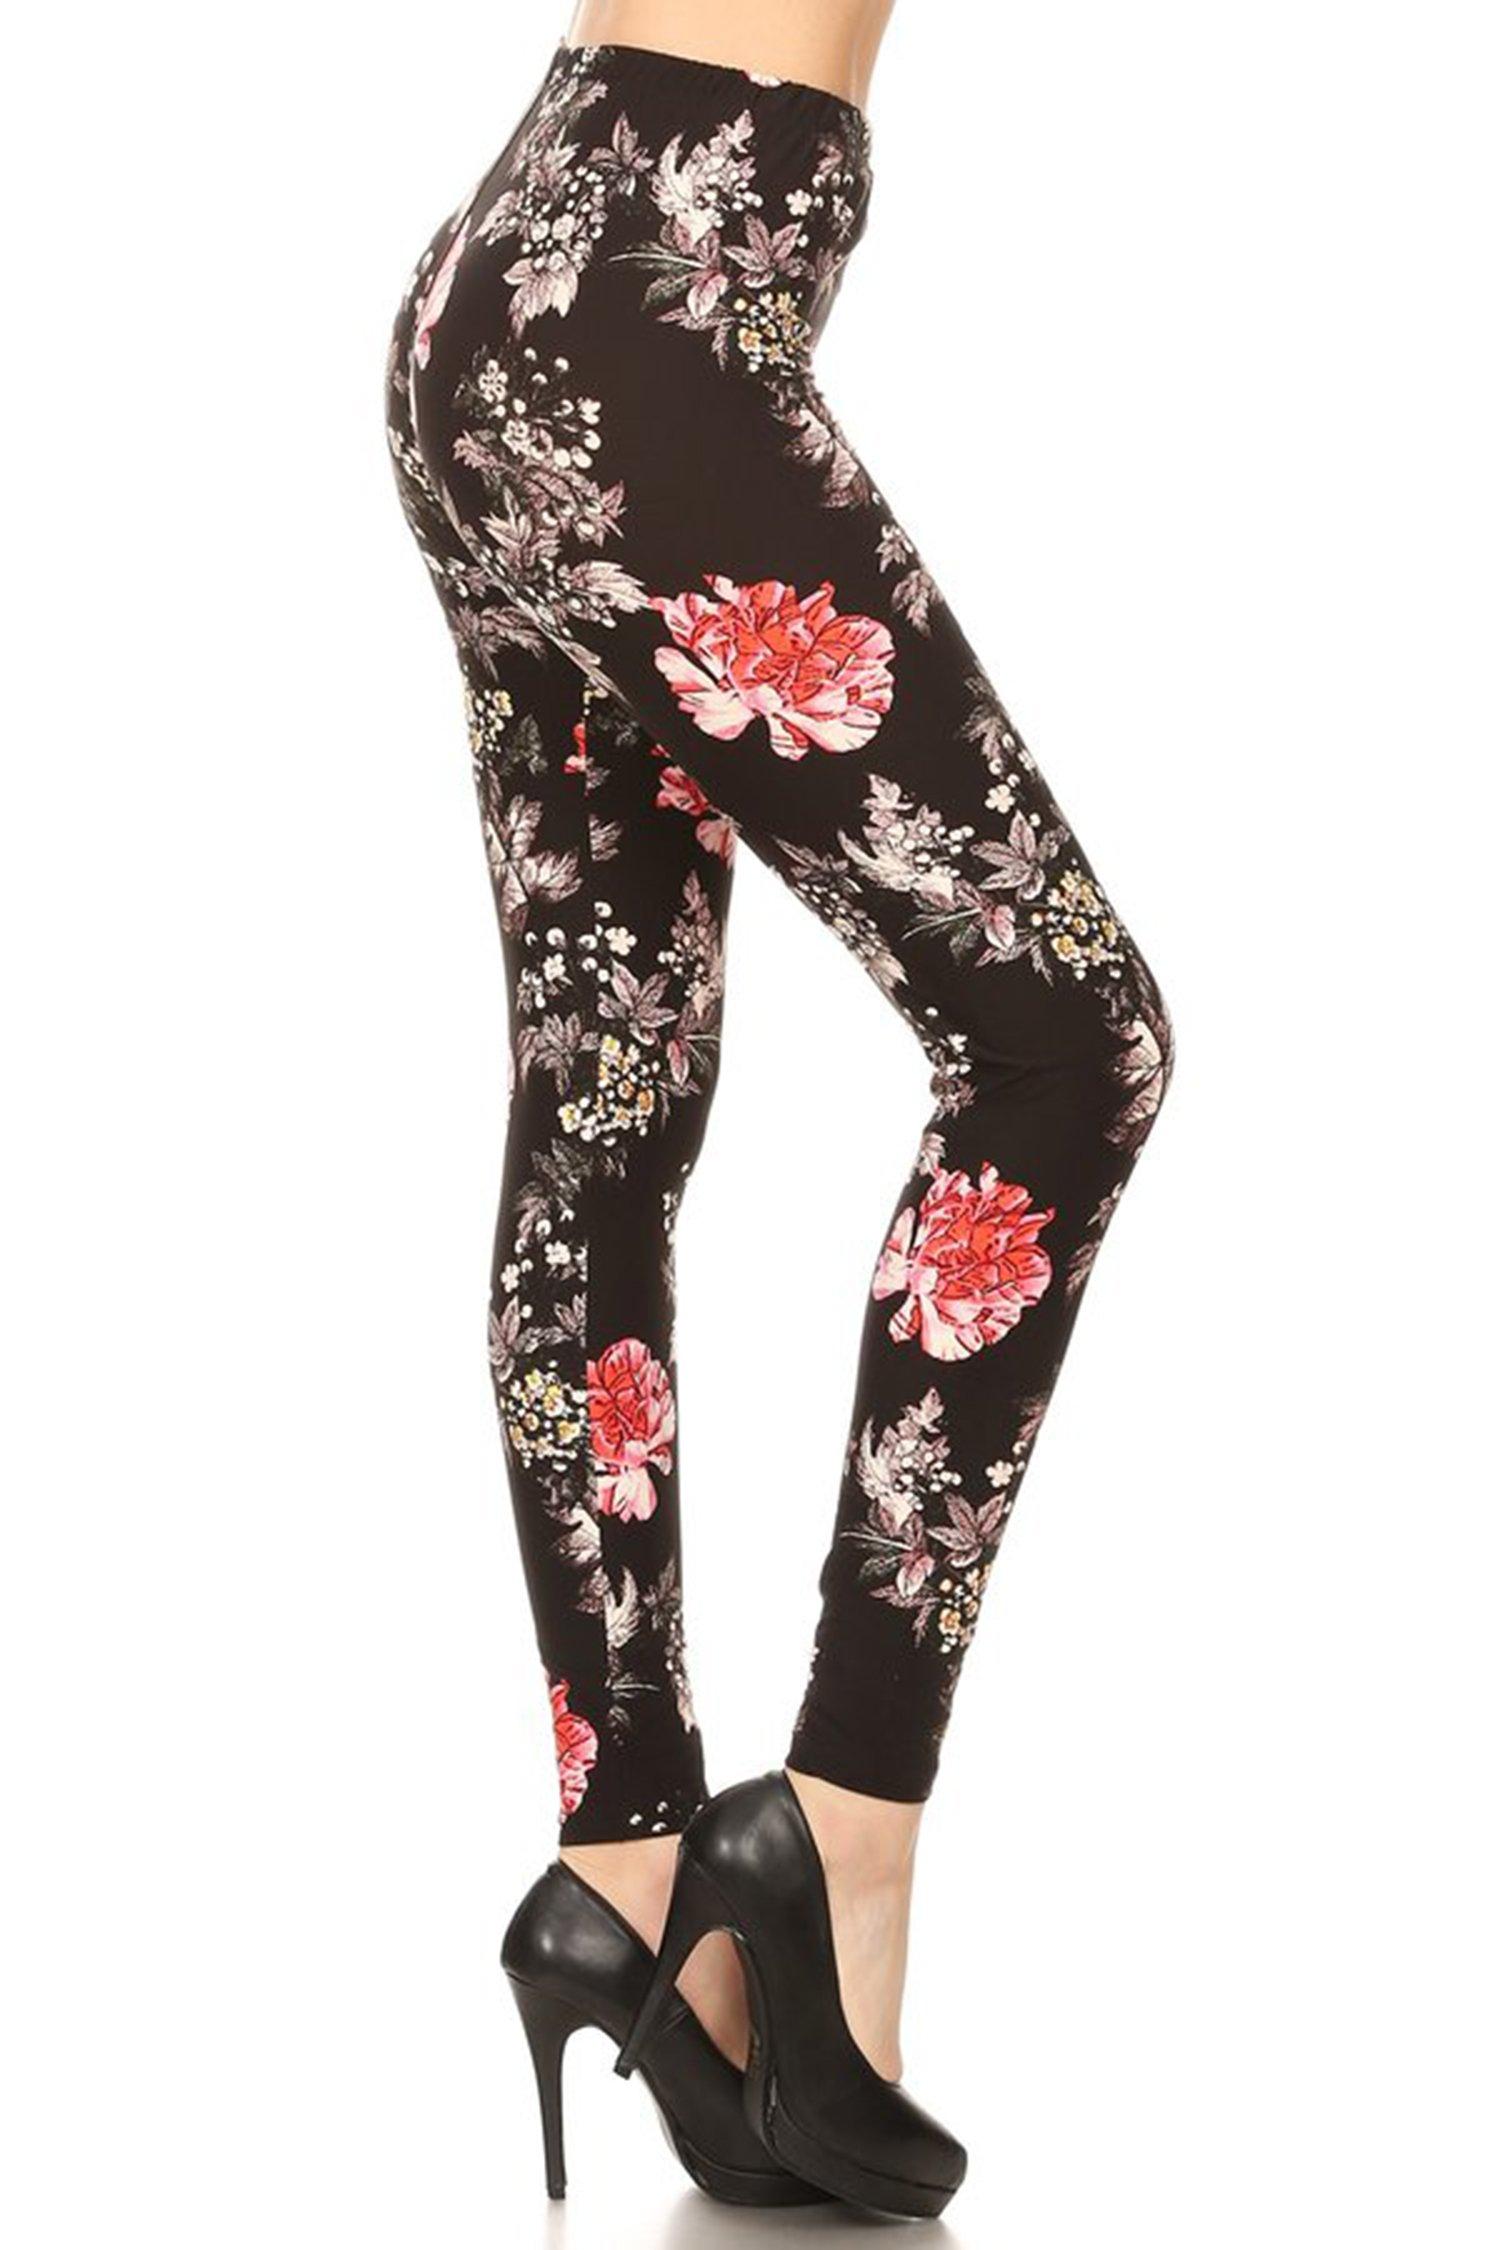 Leggings Mania Women's Plus Floral Print High Waist Leggings Black Multi, Plus One Size Fits Most (12-22), Floral by Leggings Mania (Image #2)